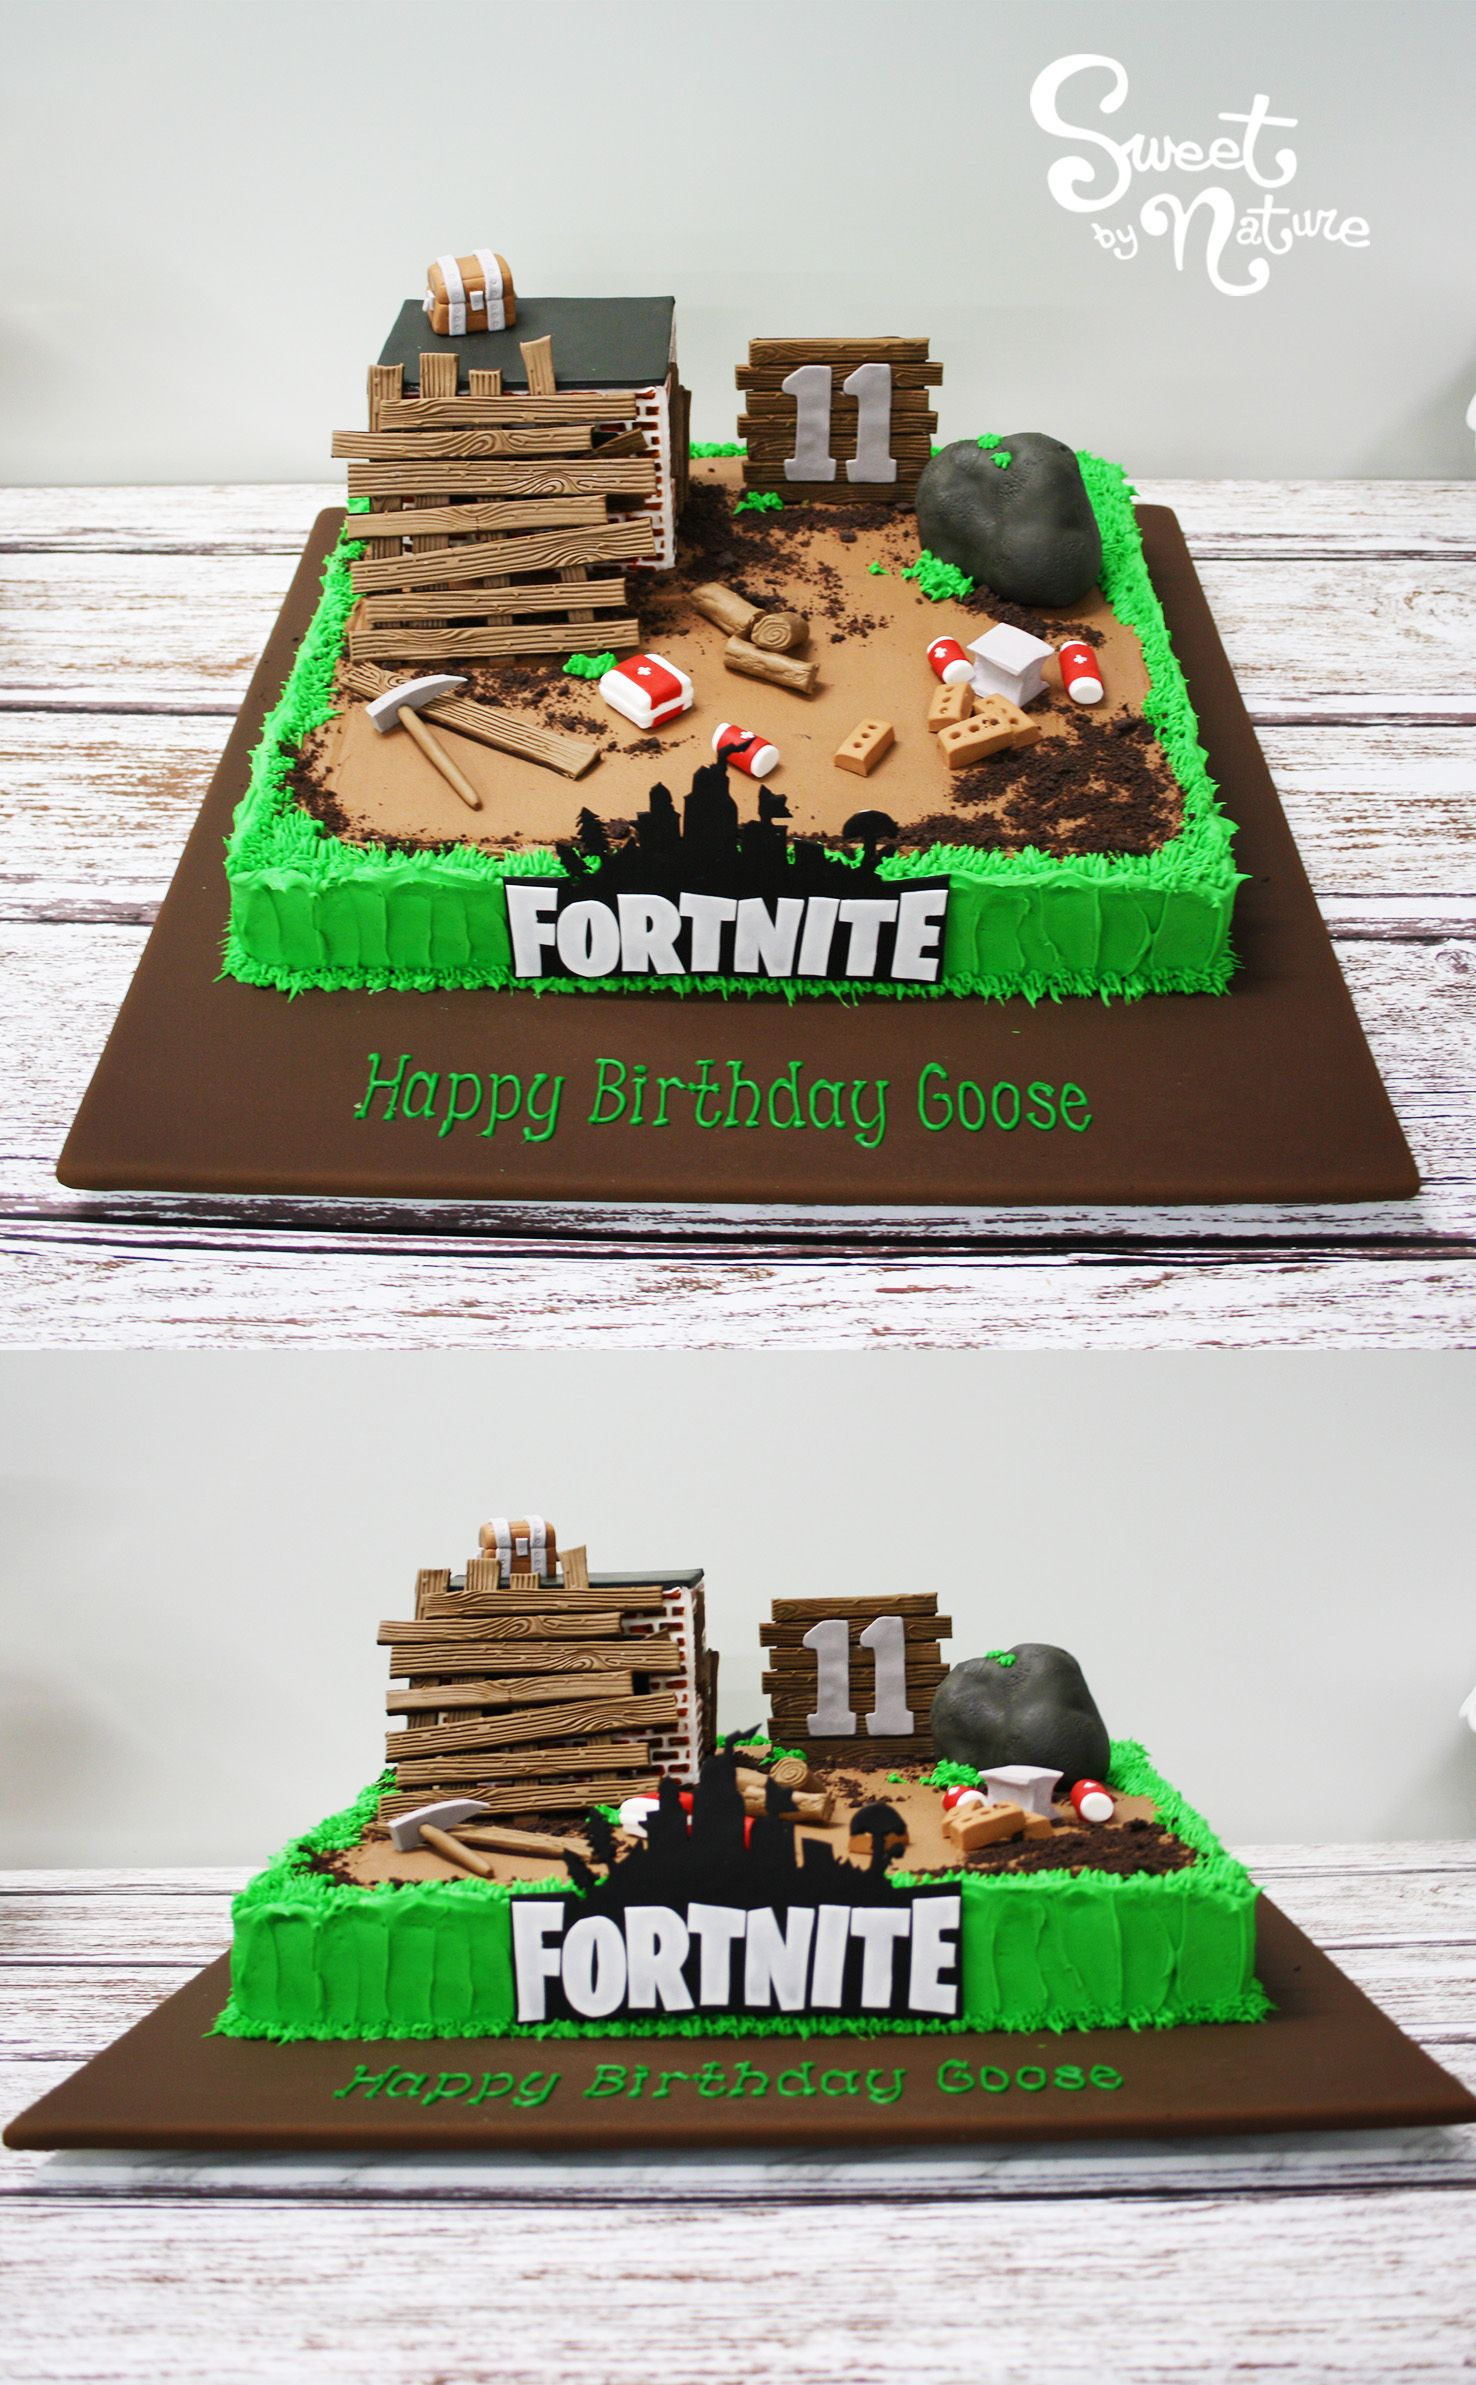 Happy Birthdsy Joseph Fortnite Cake Pin On Amazing Cake Ideas